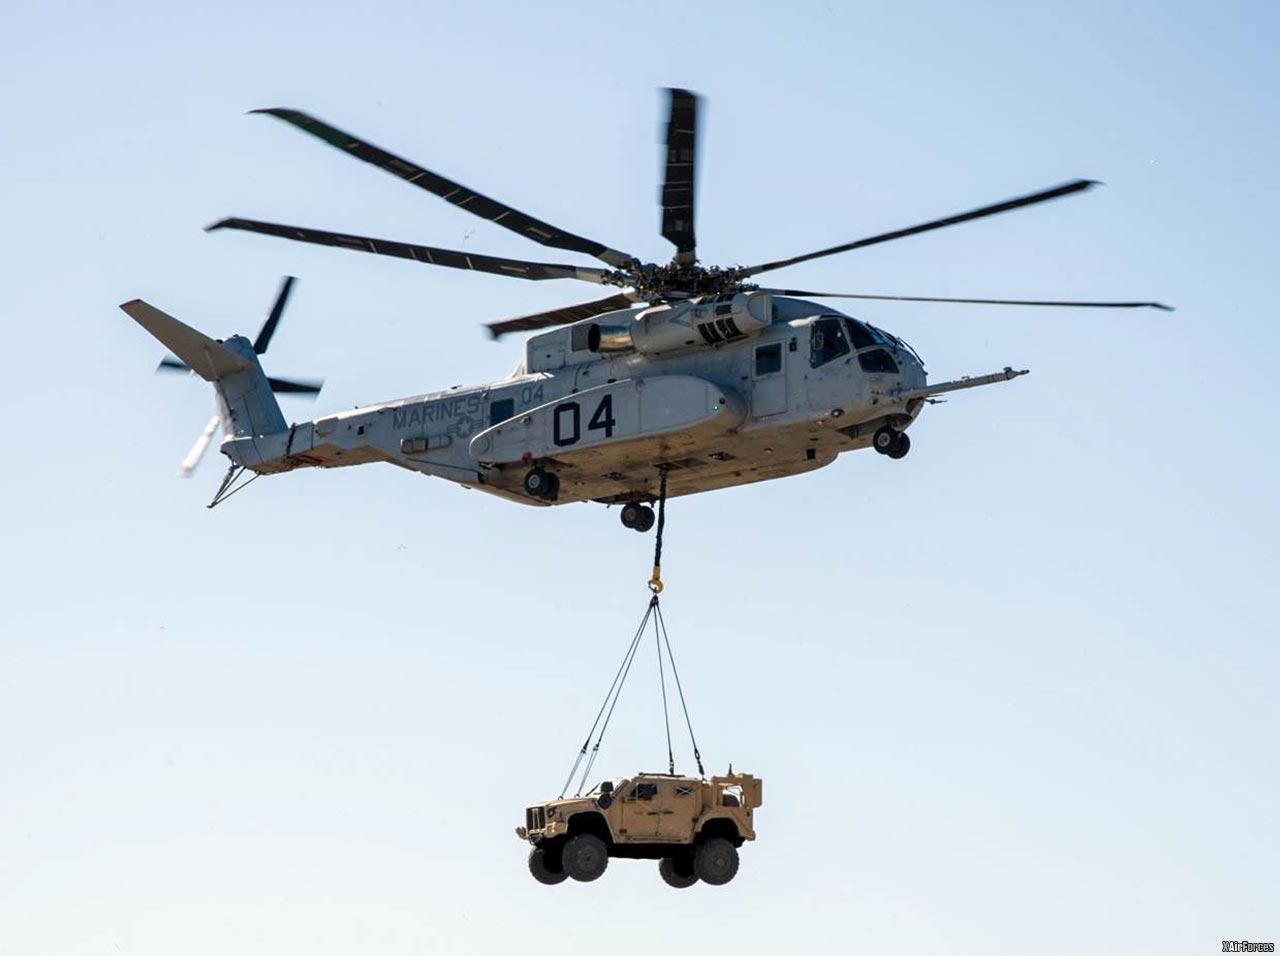 USMC Sikorsky CH-53K (04) Heavy Lift Helicopter.